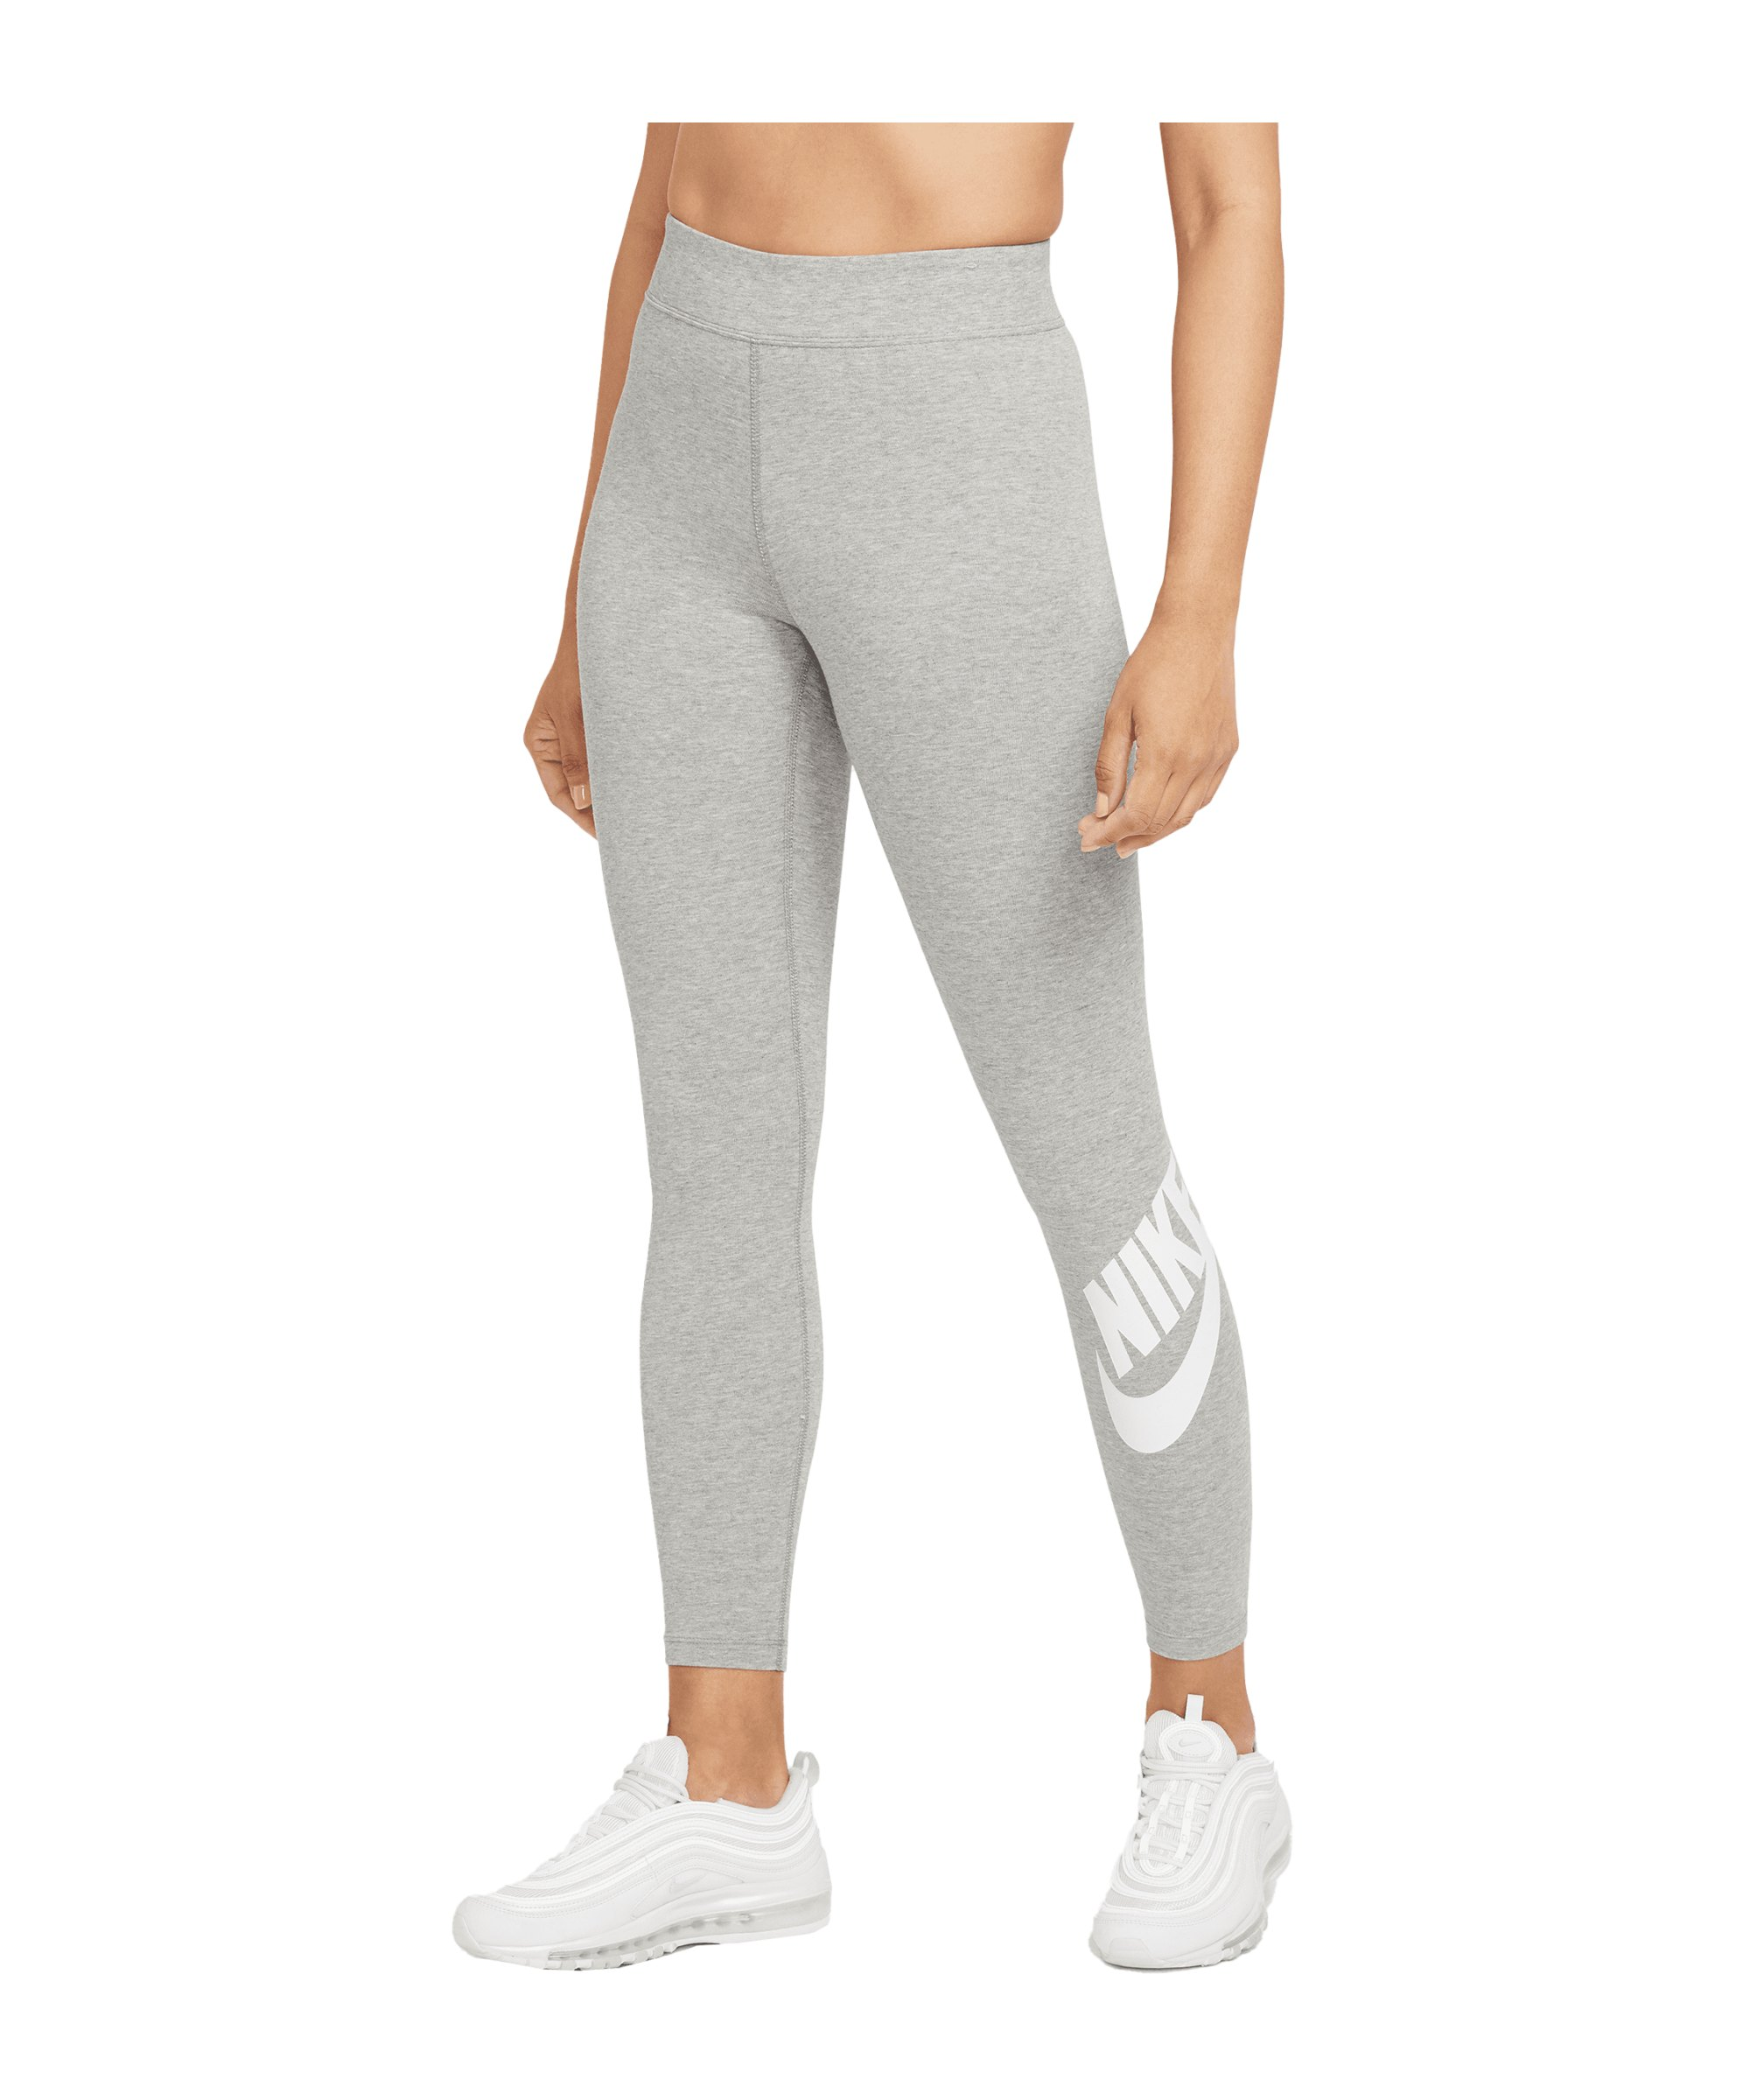 Nike Essentials Leggings Damen Grau Weiss F063 - grau